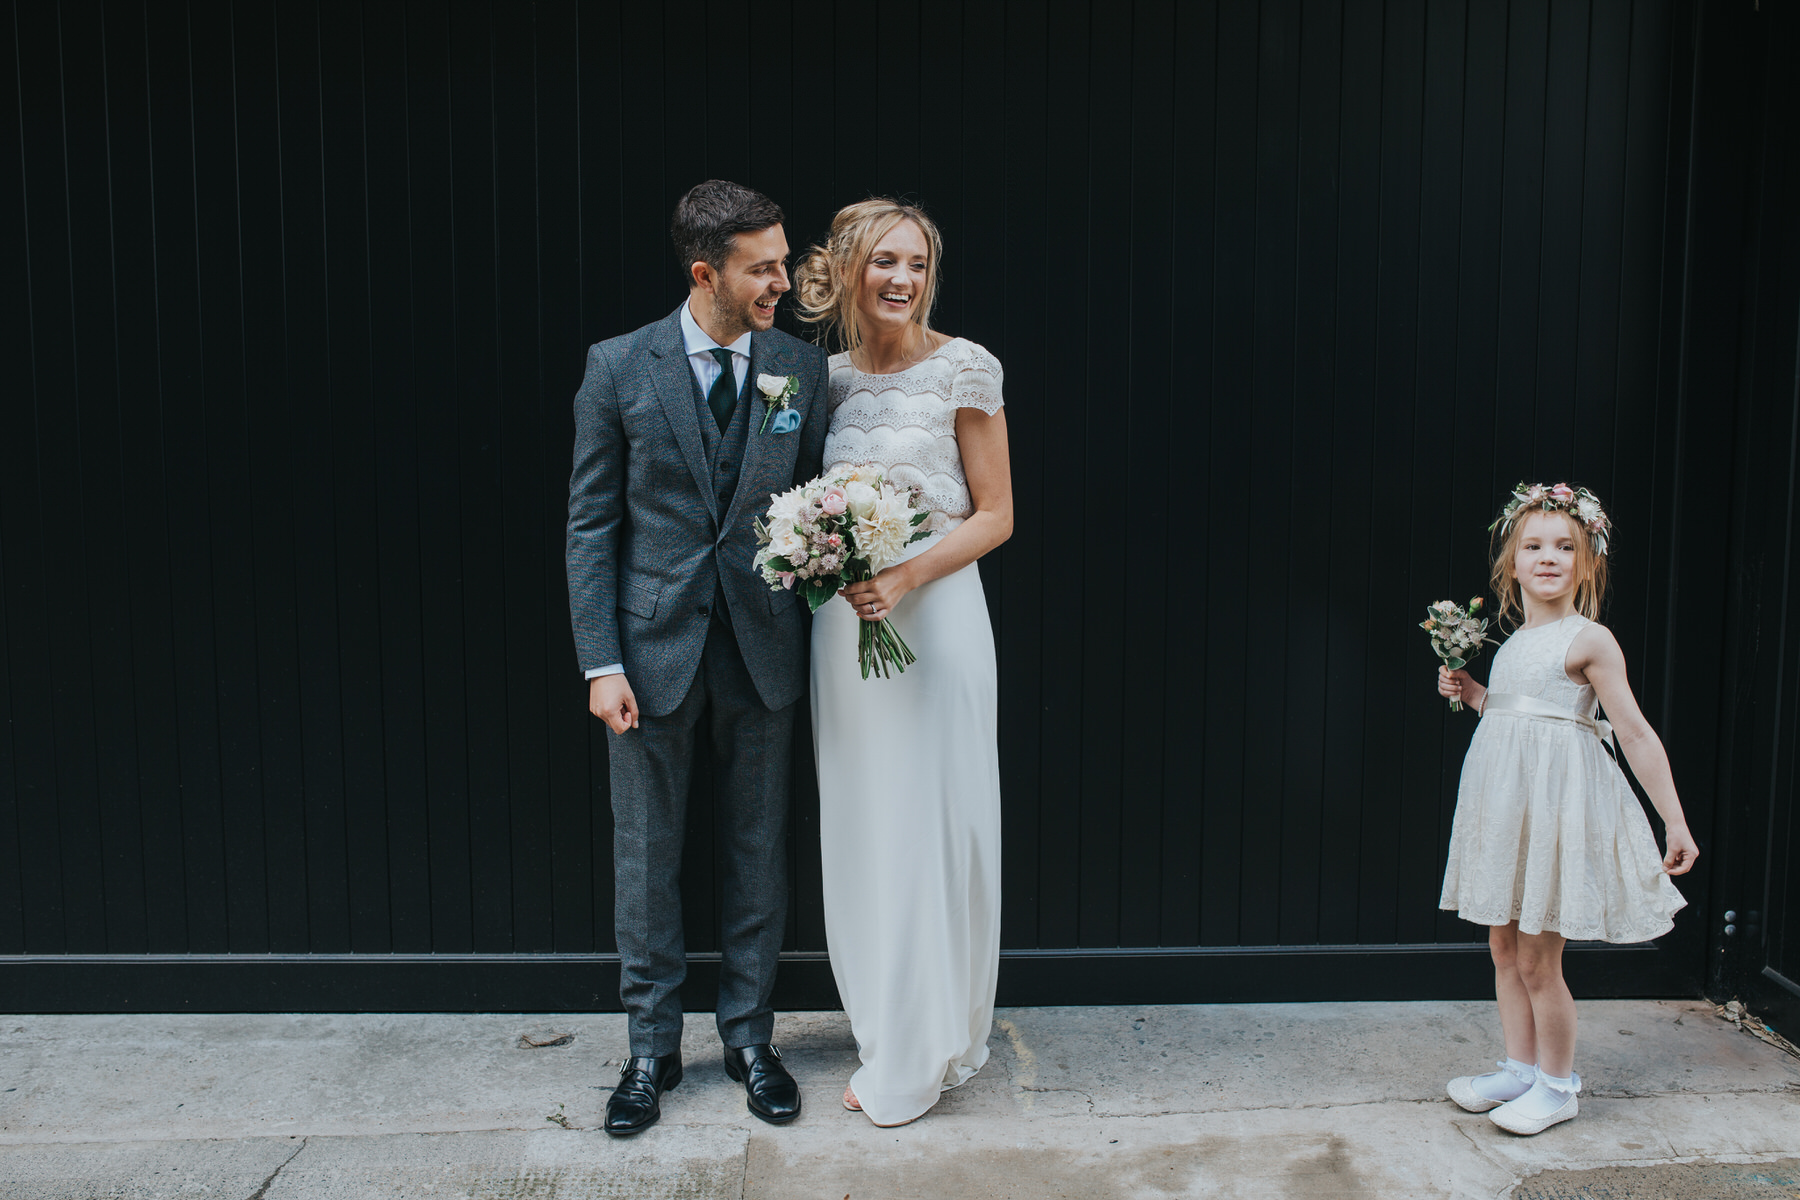 flower girl photobombs newlyweds bridal portrait.jpg